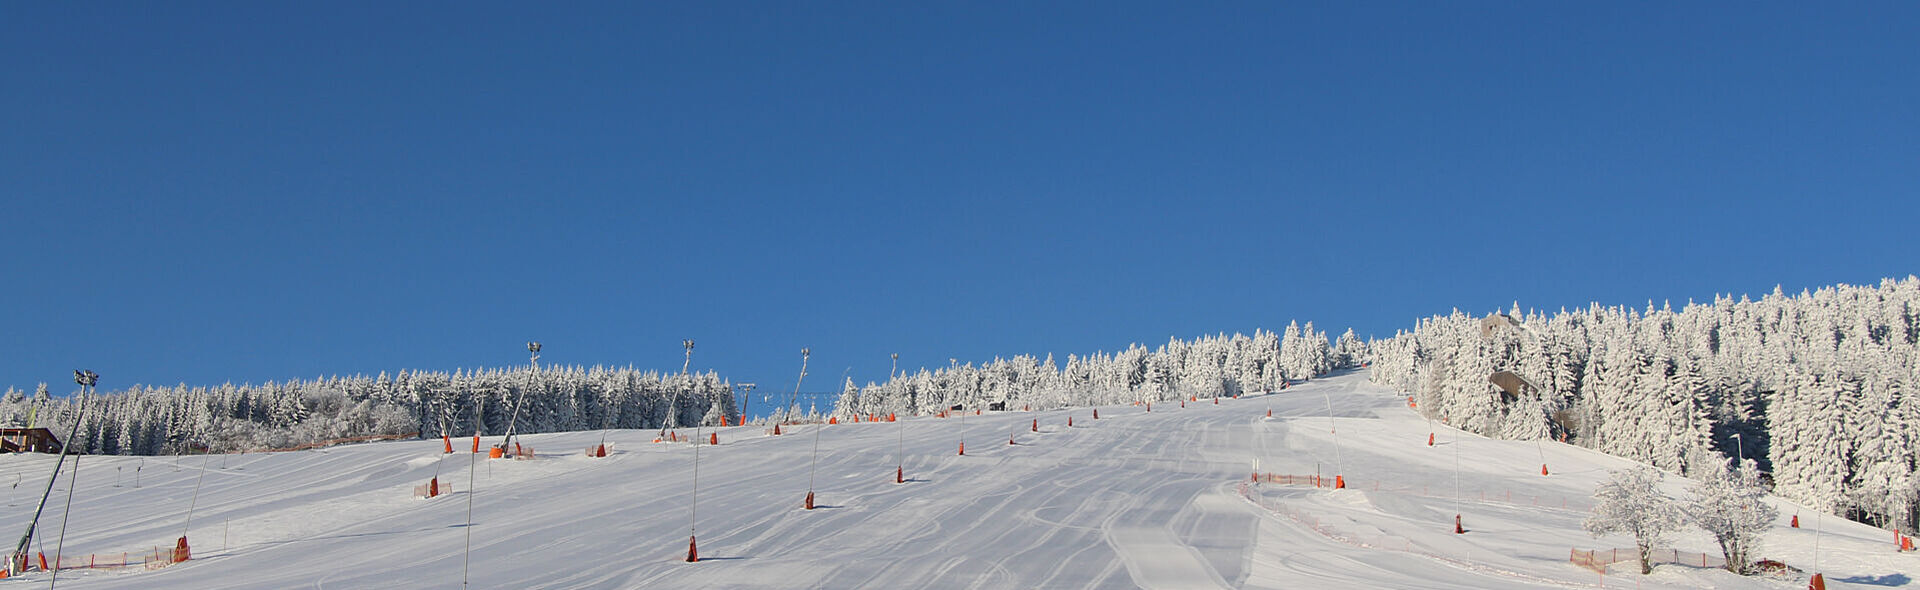 Alpin Ski Fichtelberg Oberwiesenthal Trainingszentrum